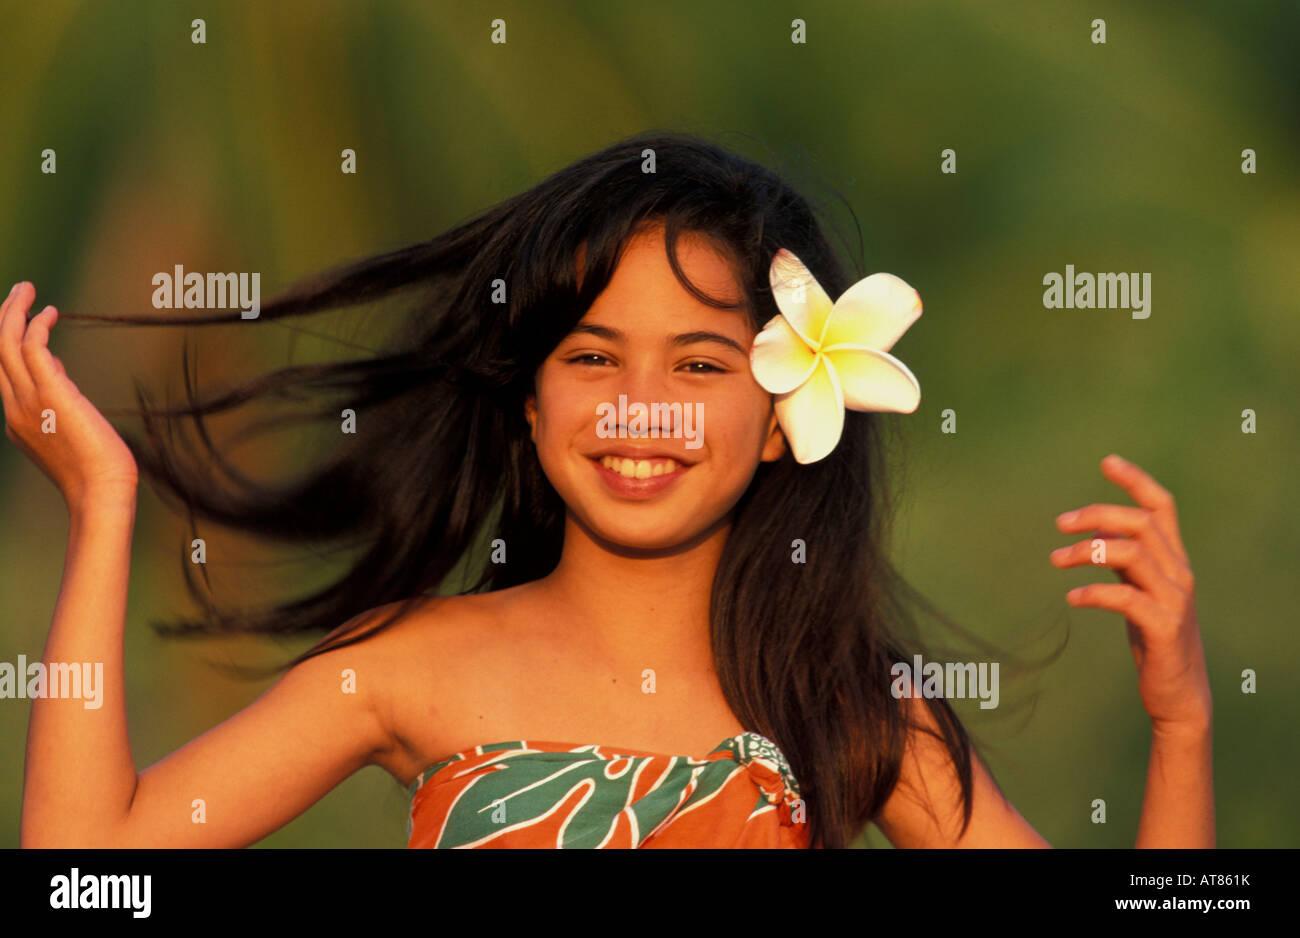 lokale hawaiian mà dchen là chelnd mit blume im haar stockfoto bild